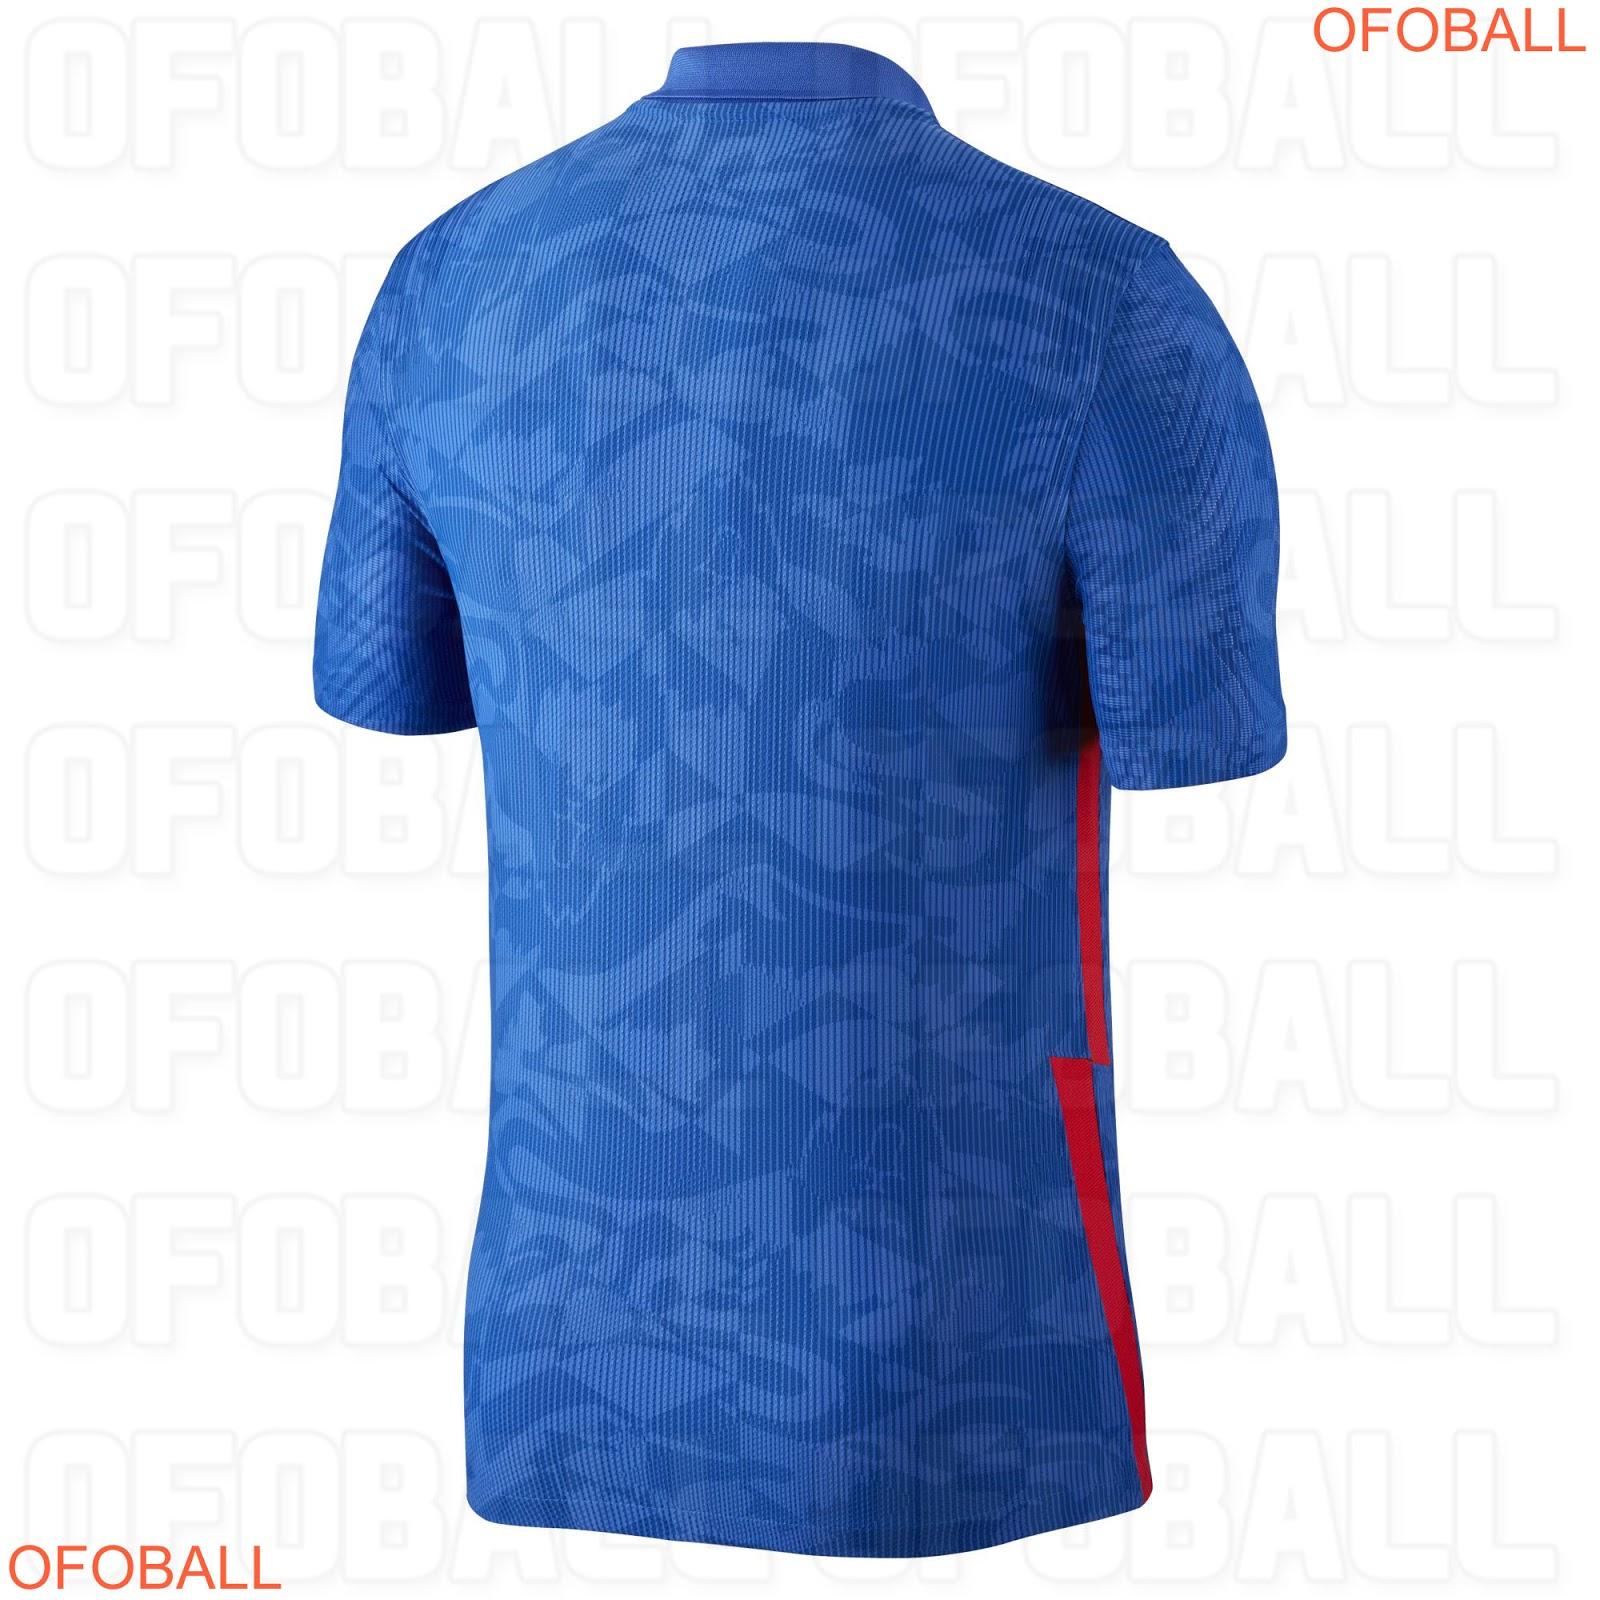 England_2020_21_Away_Shirt_Leaked_b.jpeg